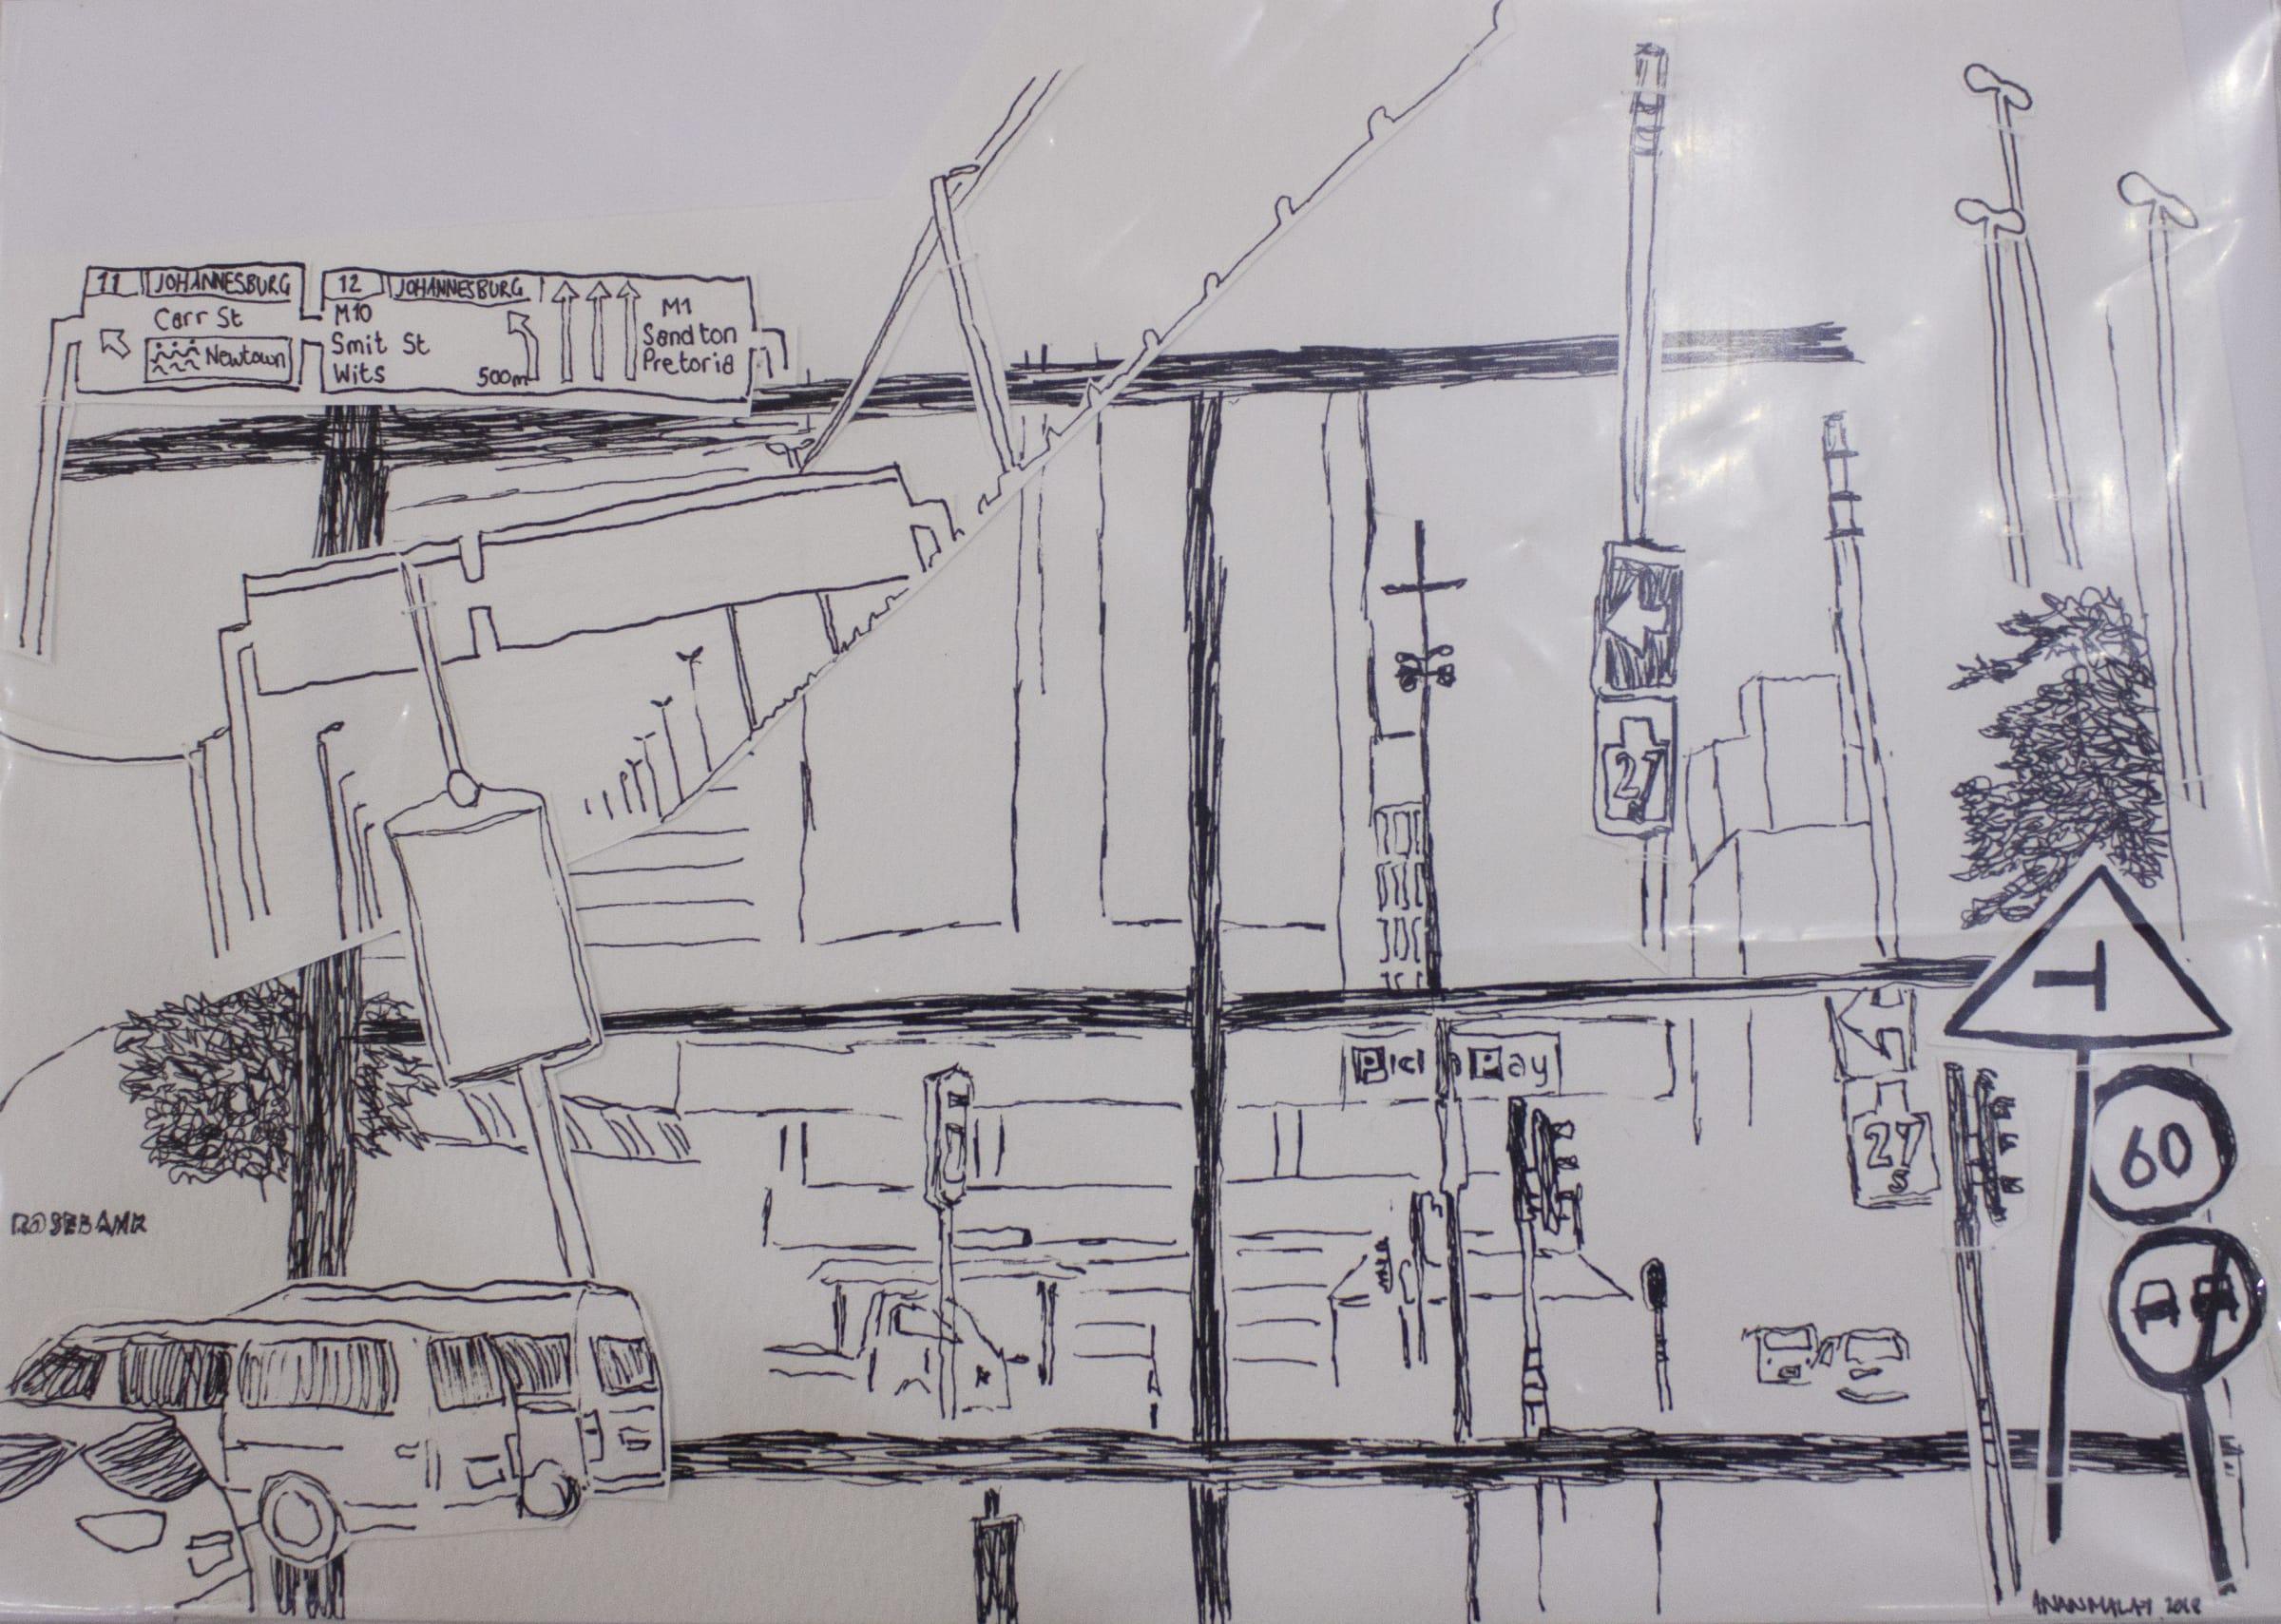 <span class=&#34;link fancybox-details-link&#34;><a href=&#34;/content/viewing-room/50/artworks2534/&#34;>View Detail Page</a></span><div class=&#34;medium&#34;>Ink Drawing On Cotton Paper</div> <div class=&#34;dimensions&#34;>21cm x 29.7cm</div>